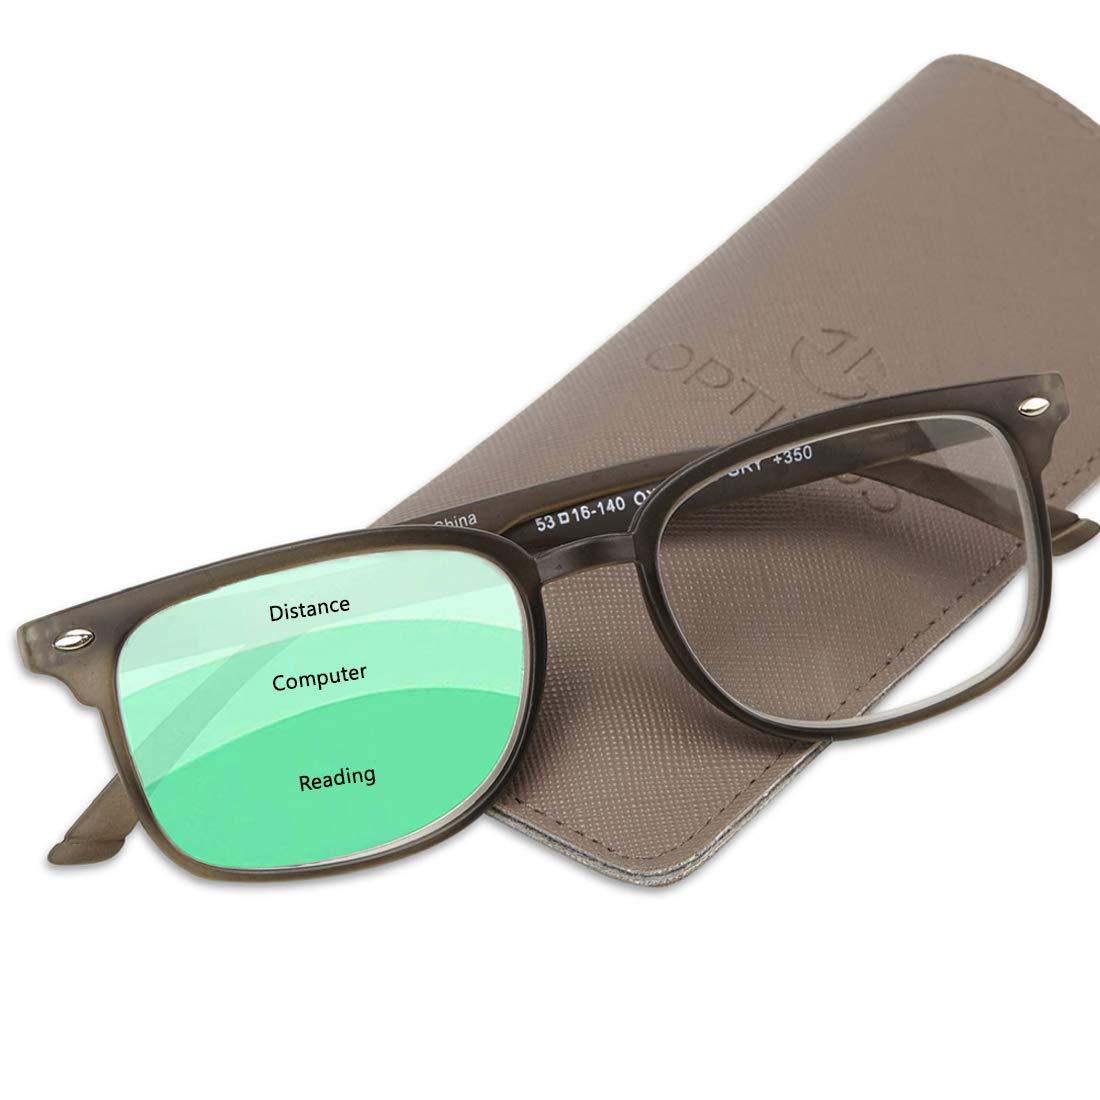 Progressive Reading Glasses Men & Women - No Line Gradual Multifocal Lenses, 3 Magnification Strengths in 1: +150 Reading, 100 Computer Desk, 50 Distance/Surroundings | Bonus Pouch Included by Optix 55